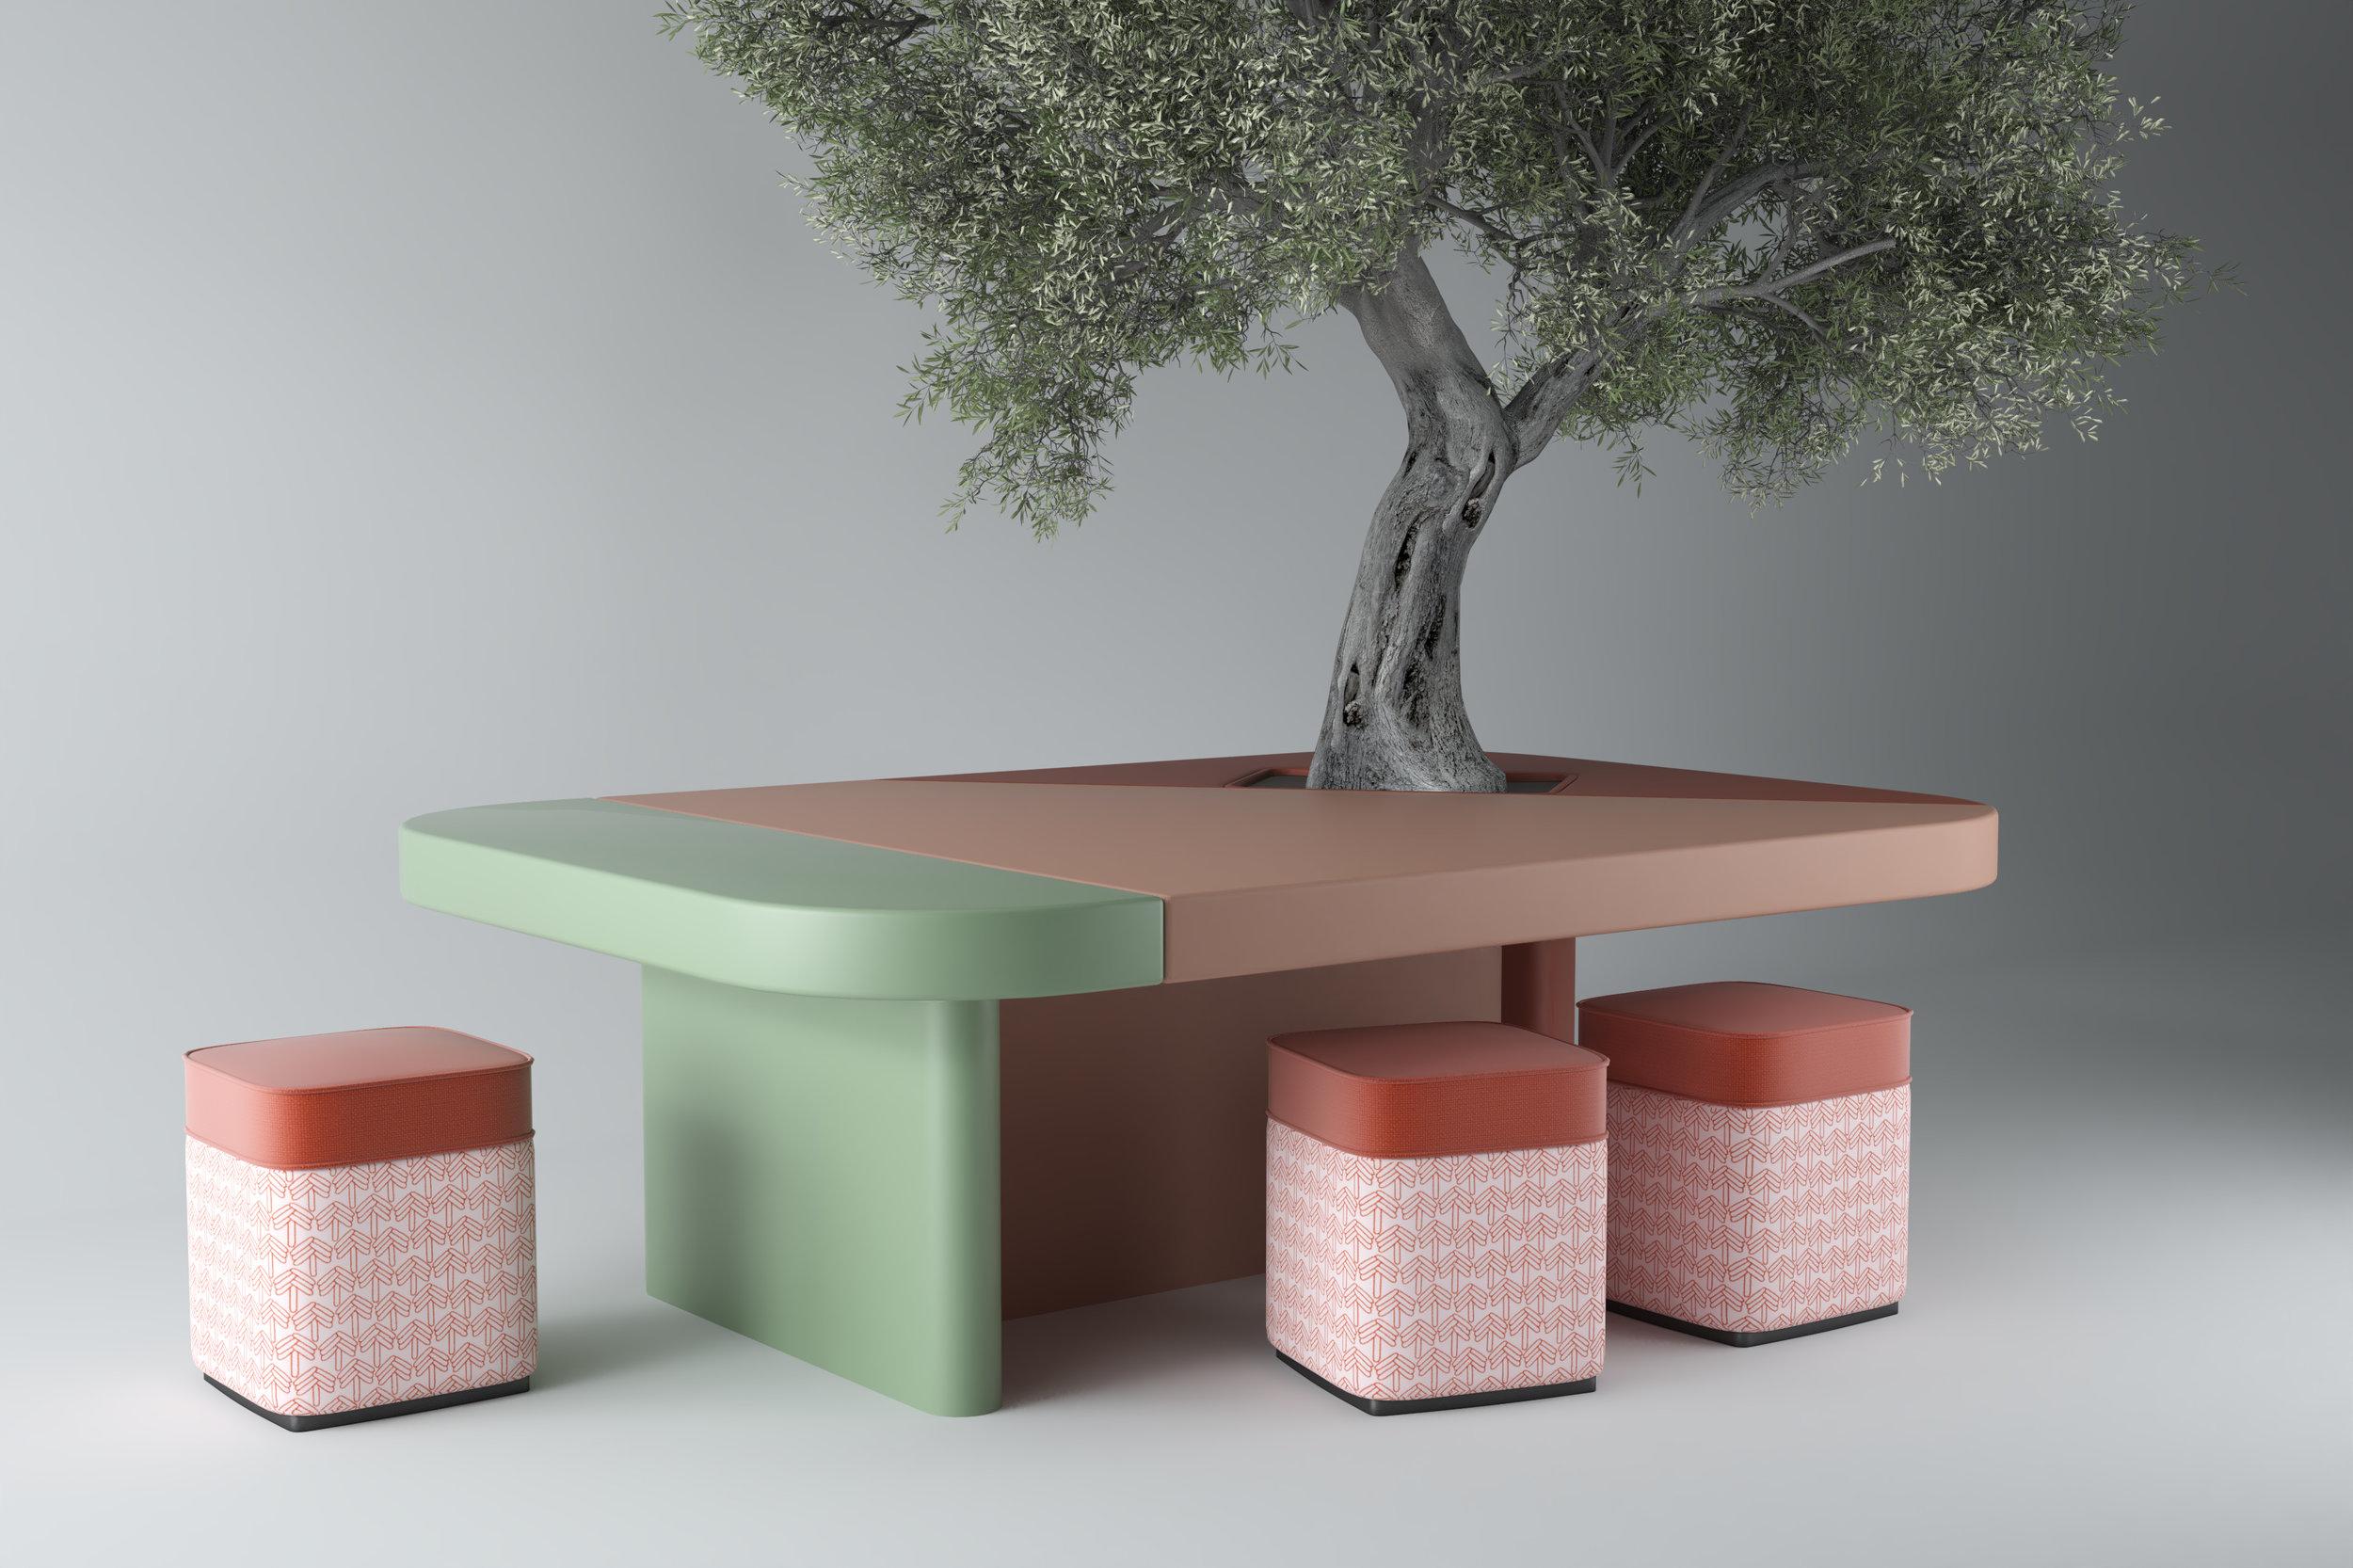 180524 olive table.jpg